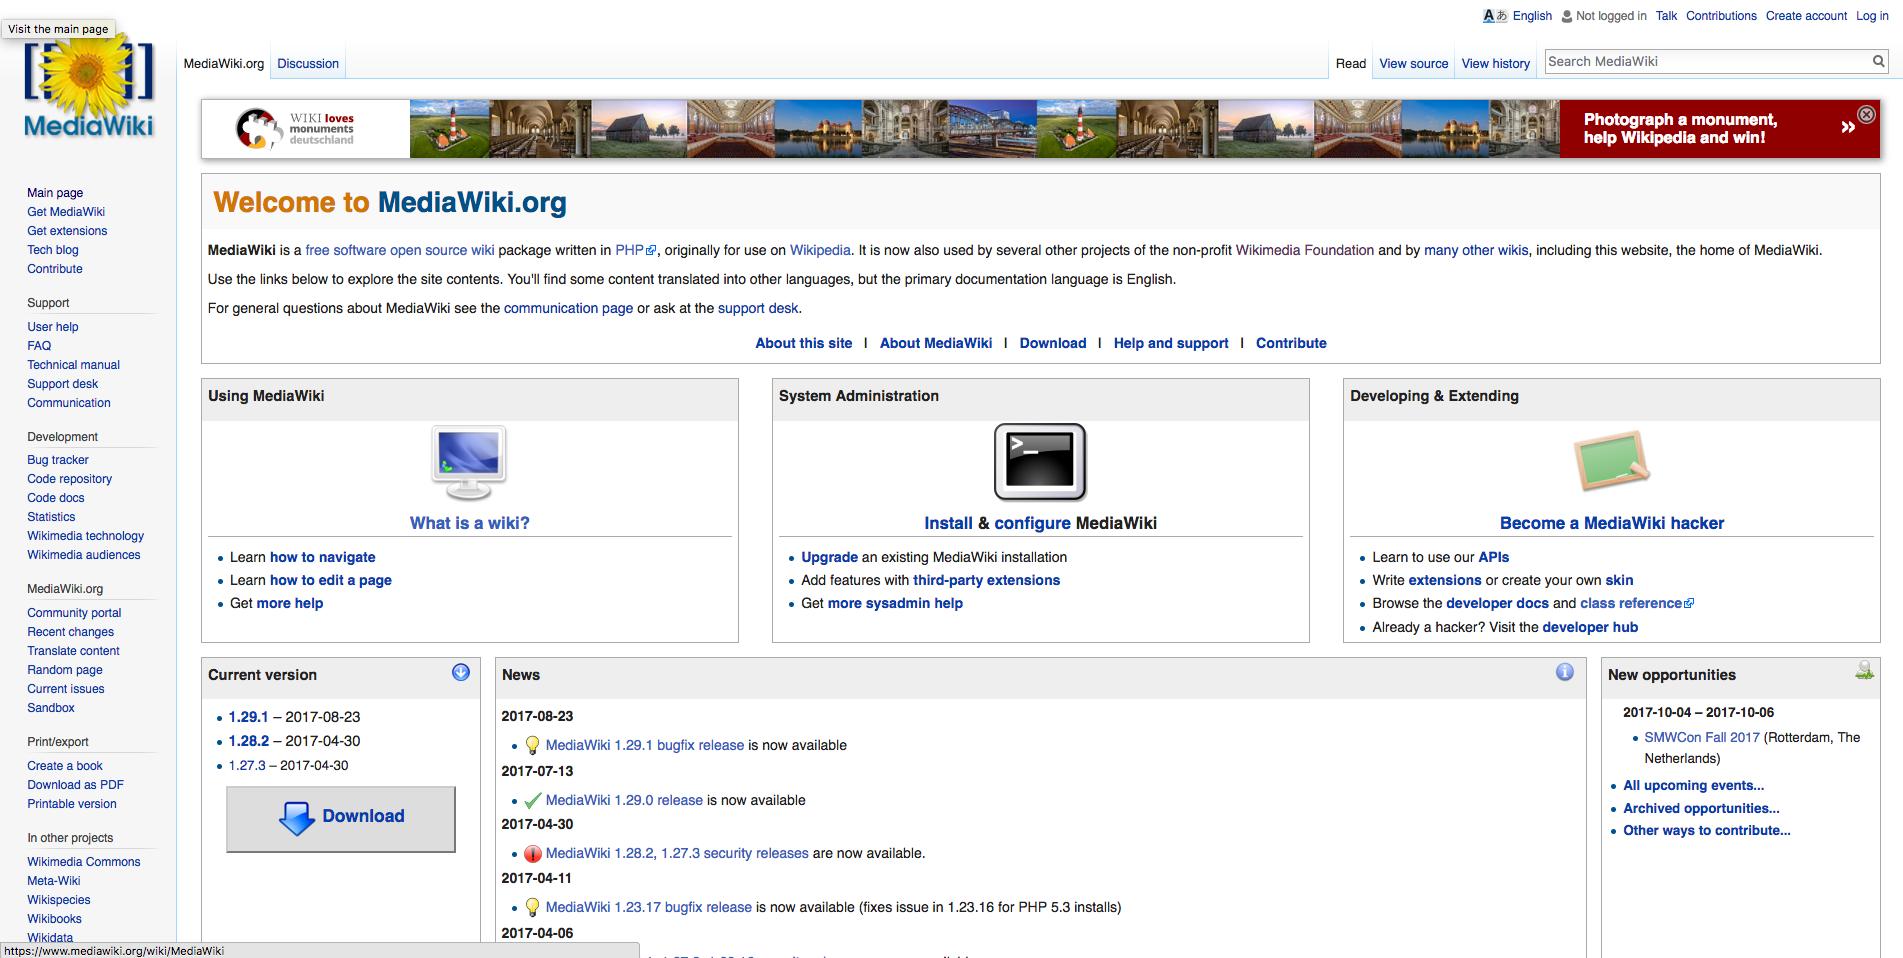 MediaWiki demo preview